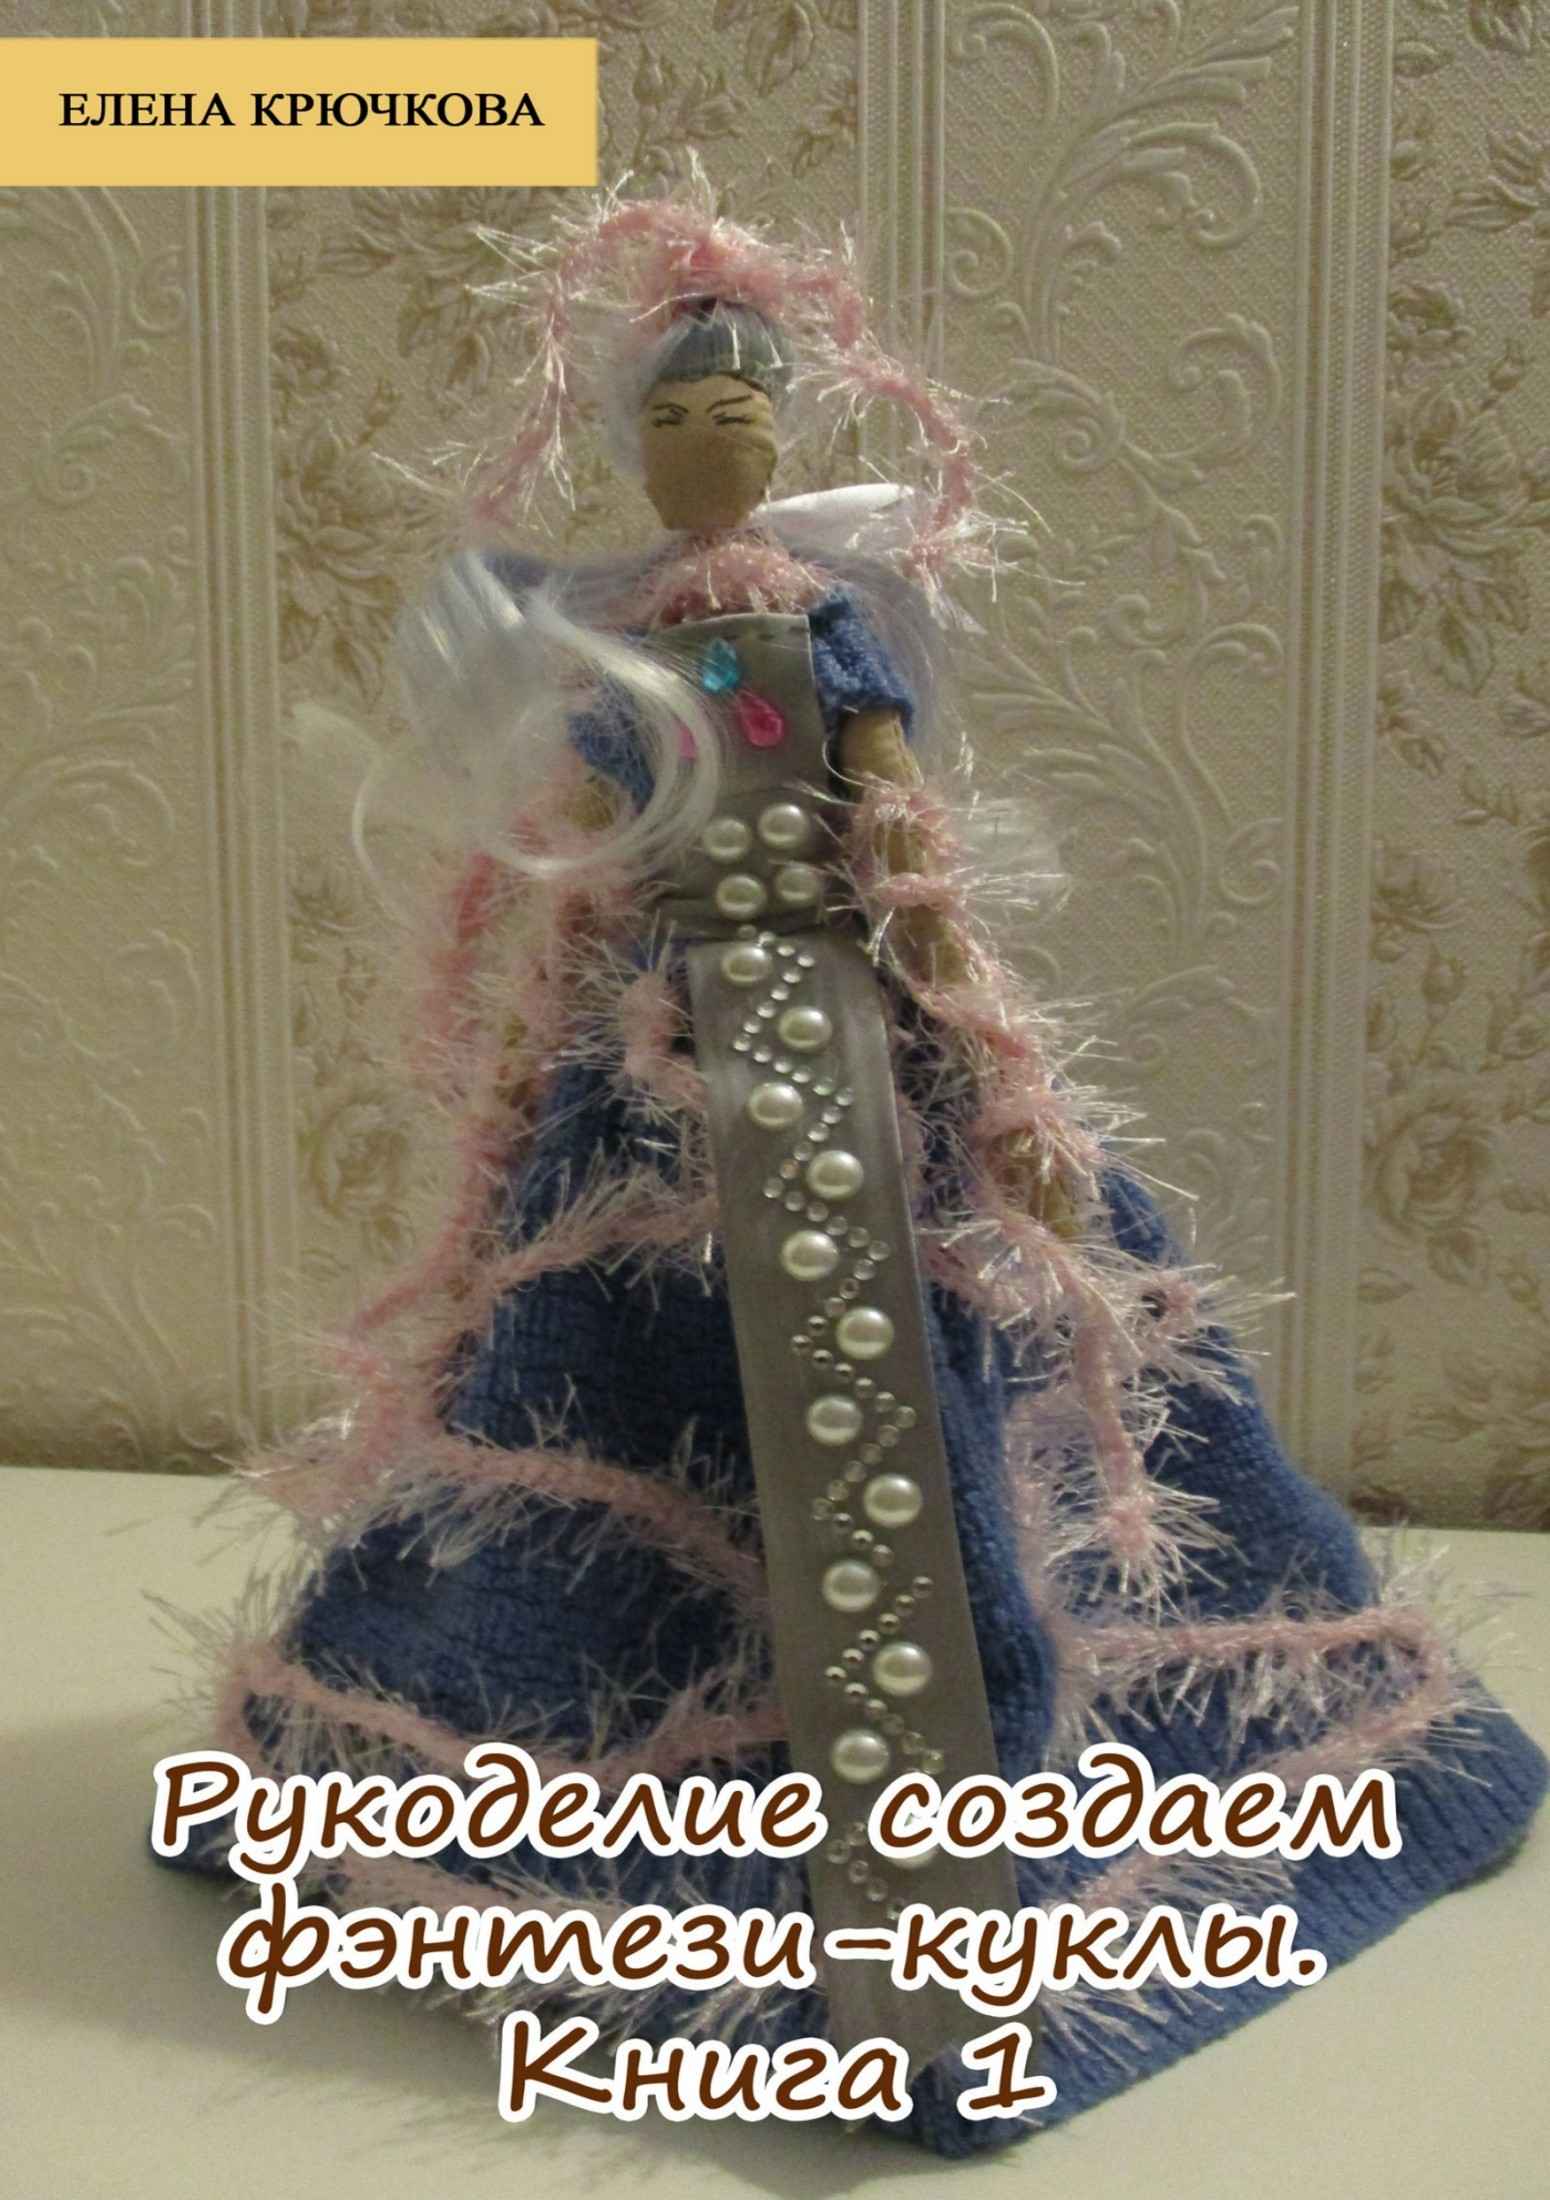 Елена Александровна Крючкова Рукоделие. Создаем фэнтези-куклы. Книга 1